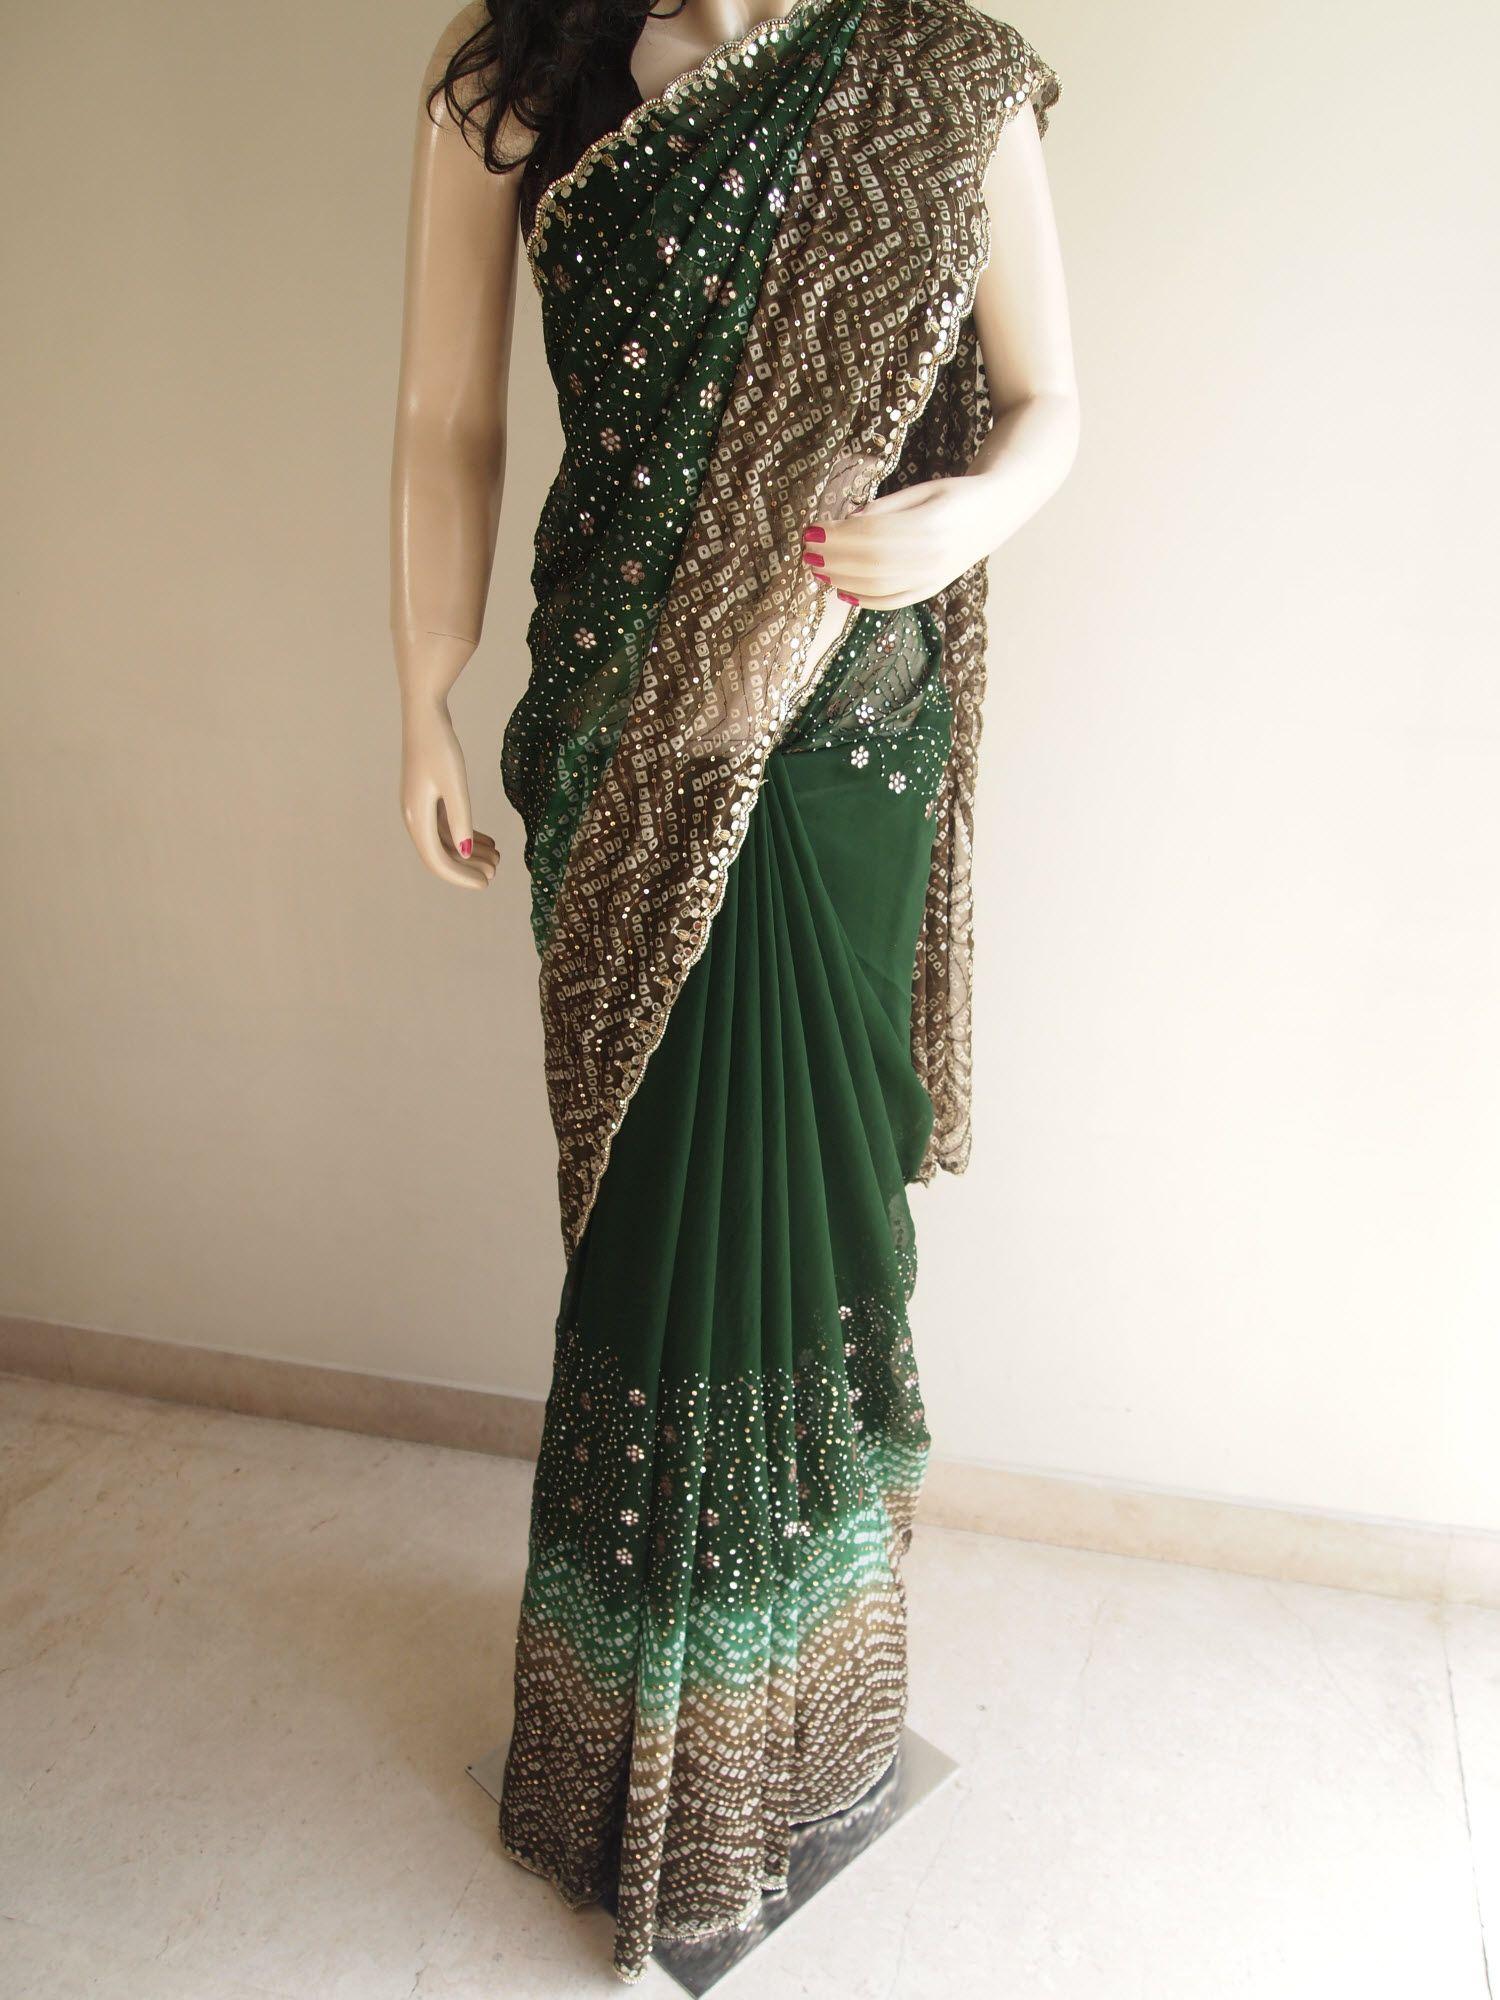 Bottle Green Pure Chiffon Saree With Mirror Work Pure Chiffon Sarees Chiffon Saree Pure Chiffon